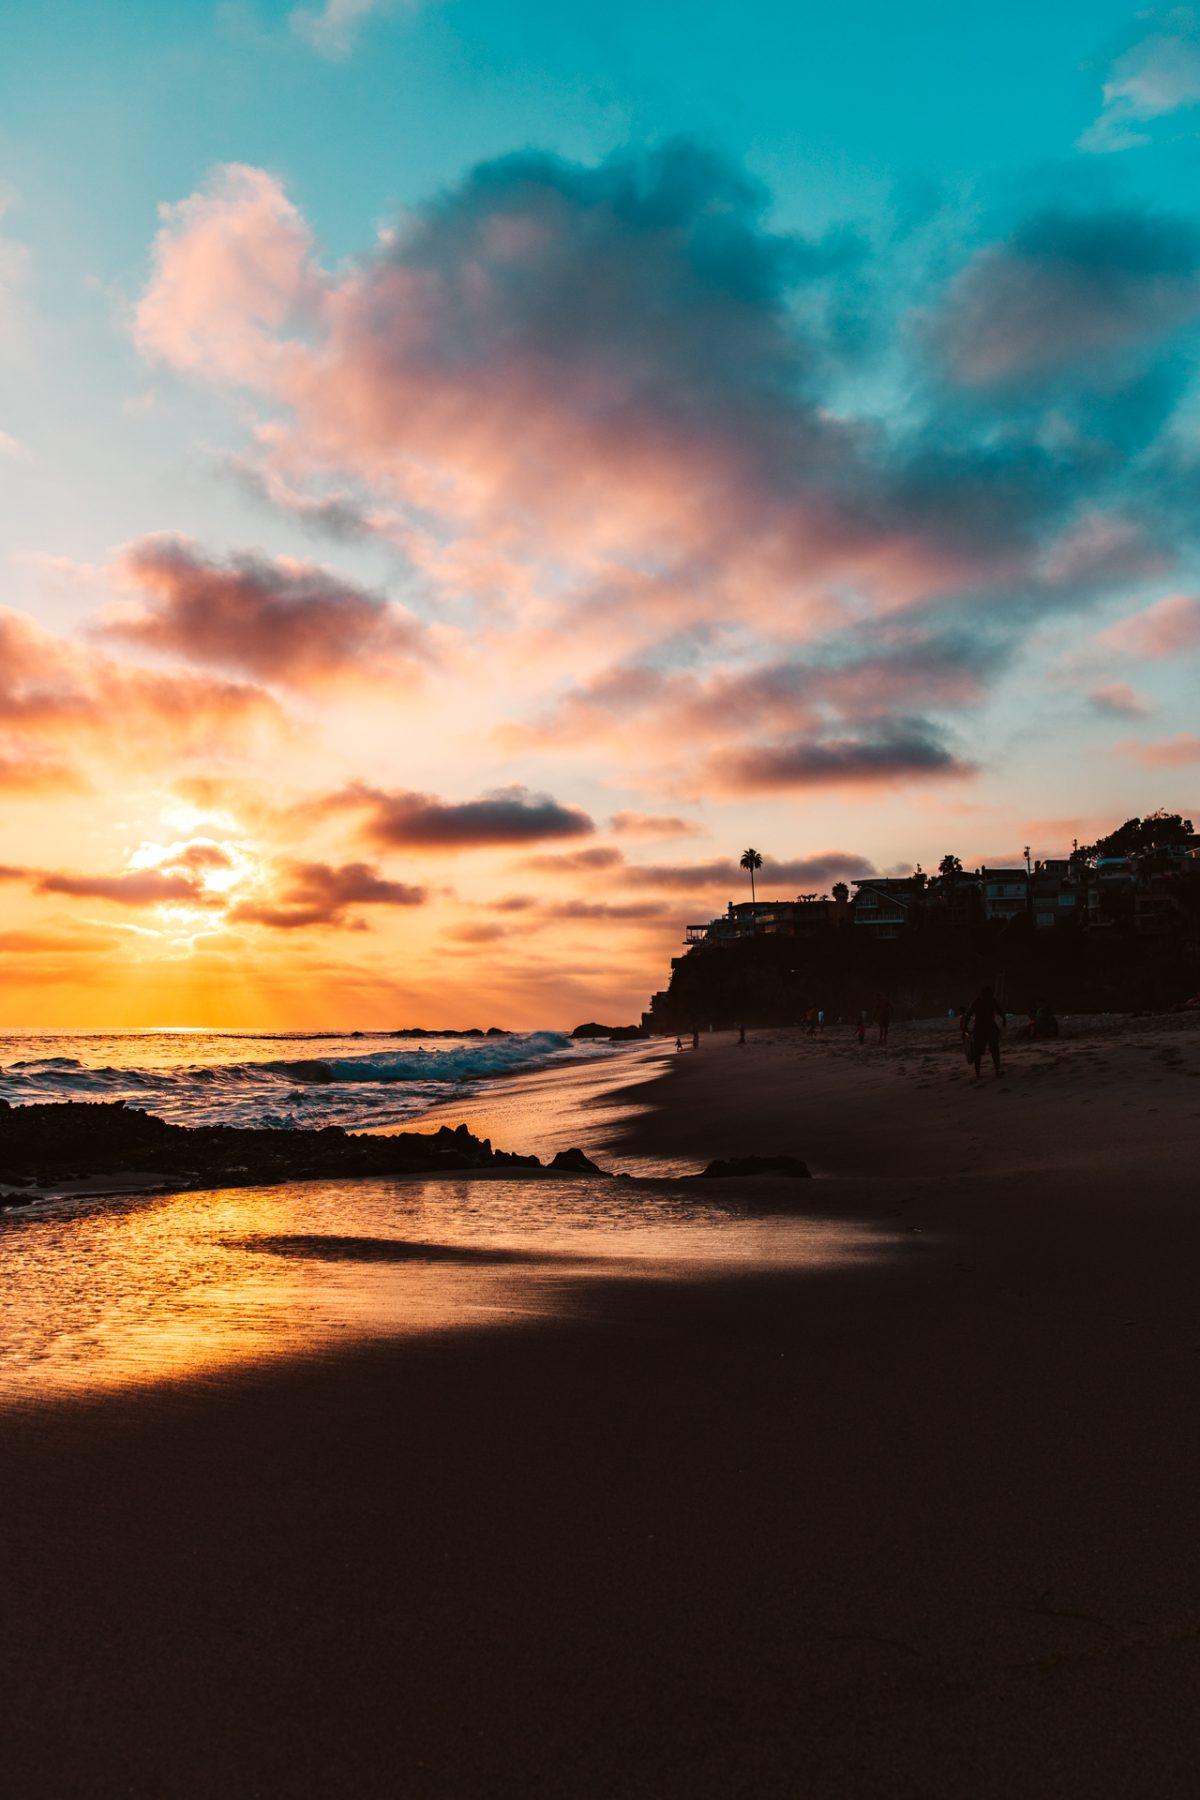 Laguna, Sunset, Beach, Longnecker